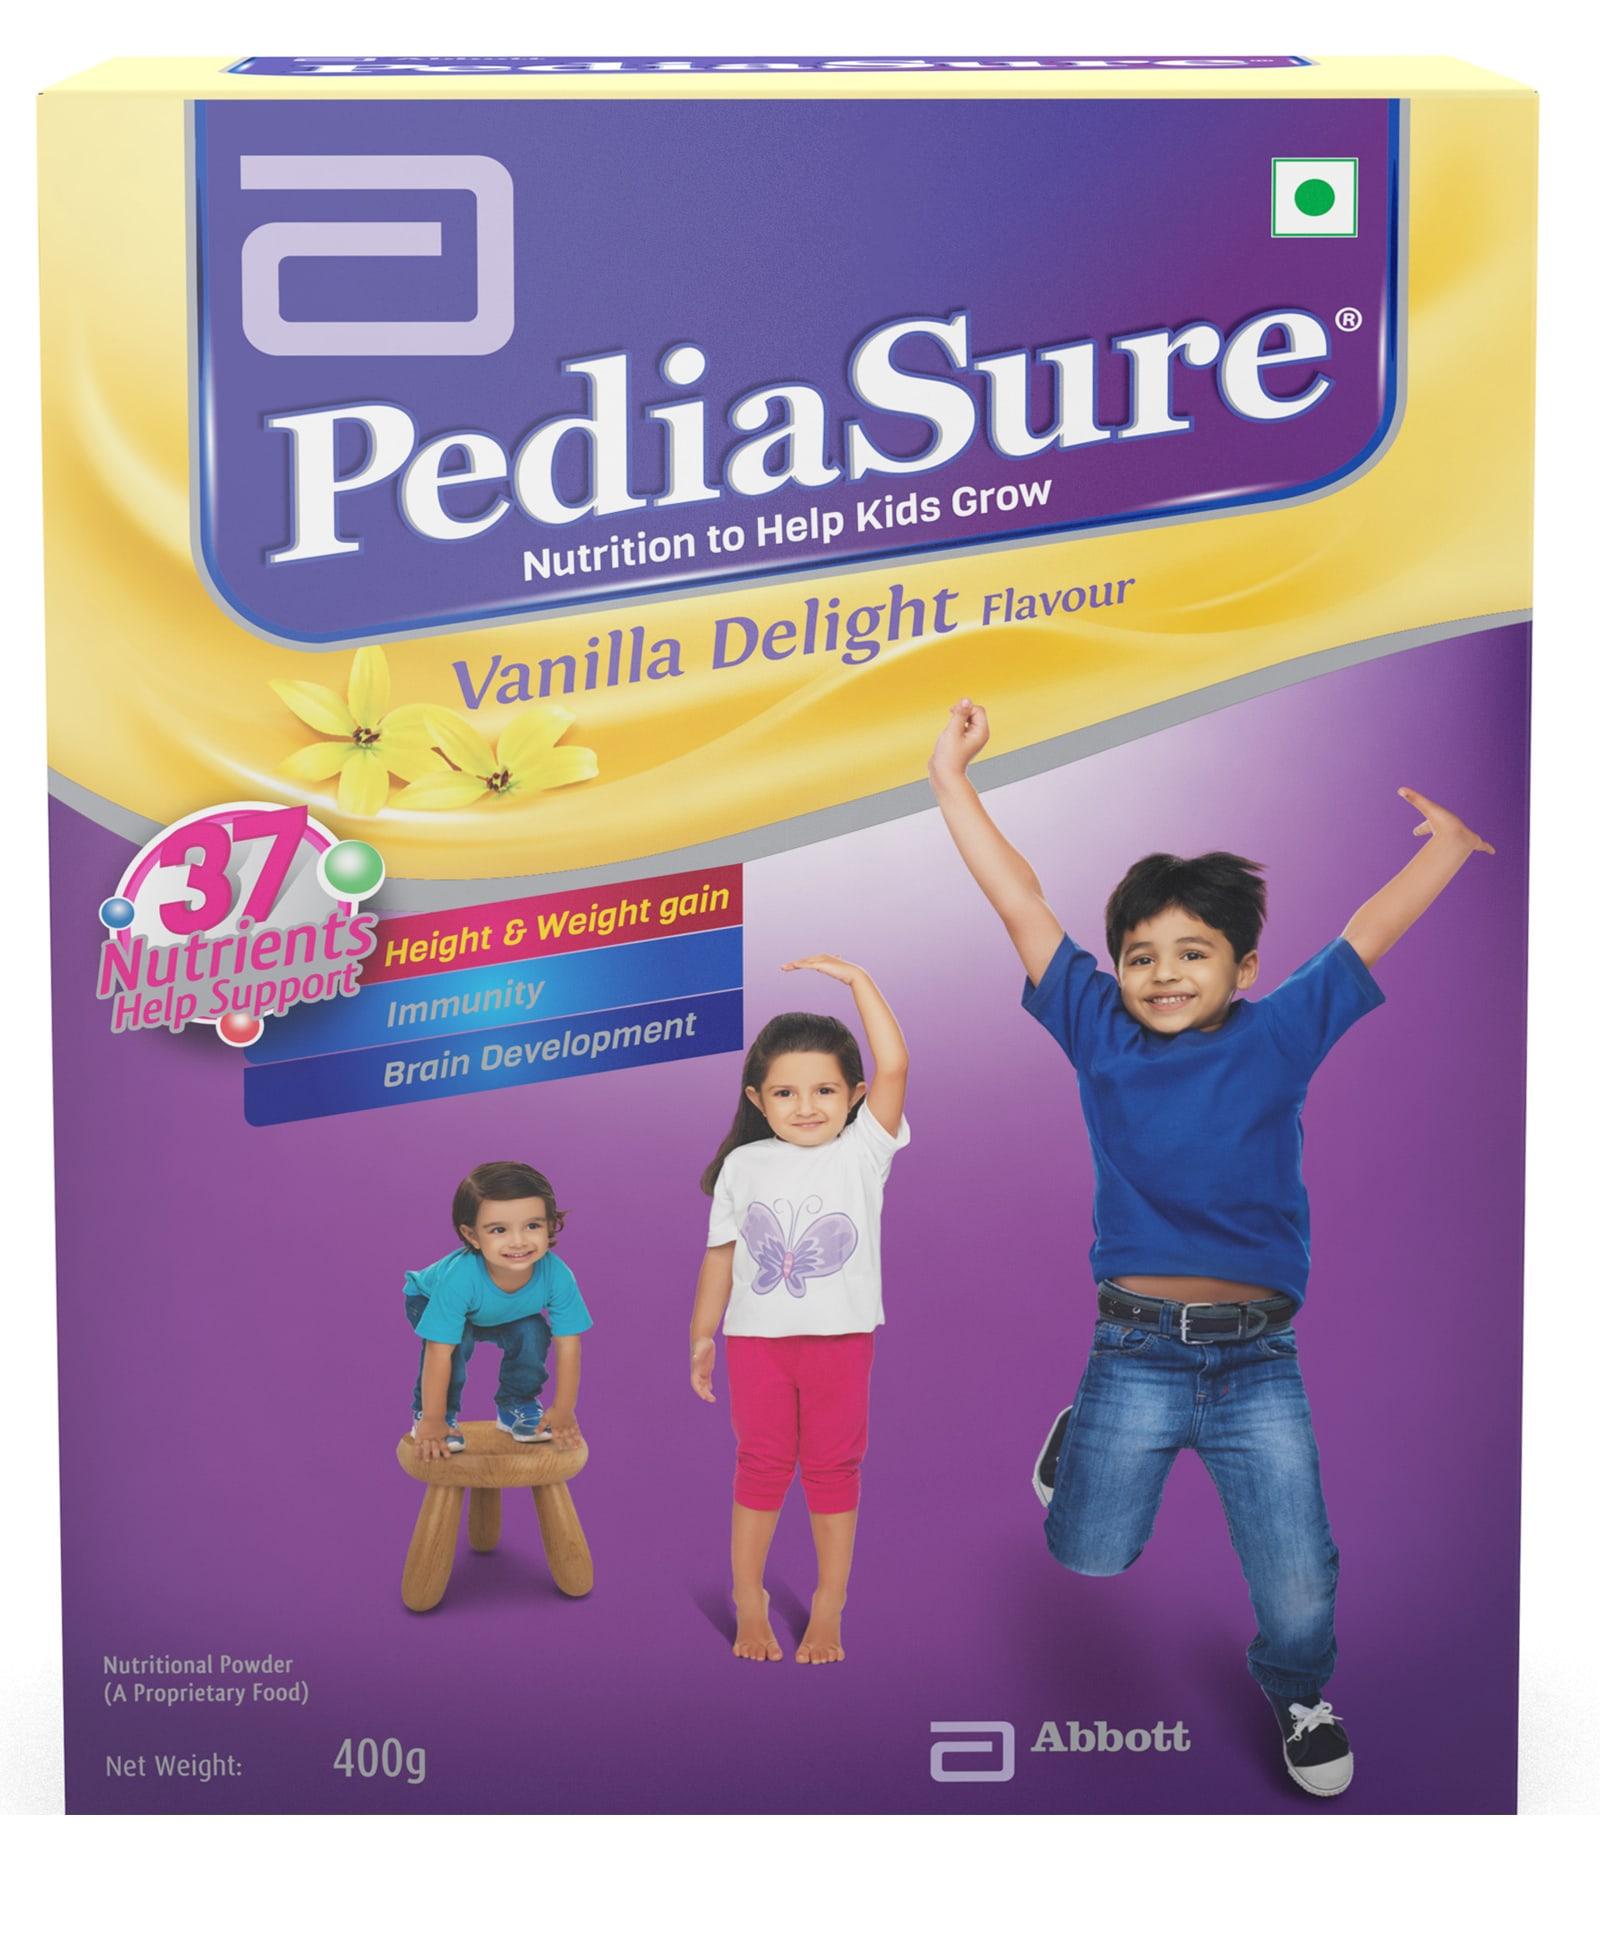 PediaSure Refill Pack Vanilla delight